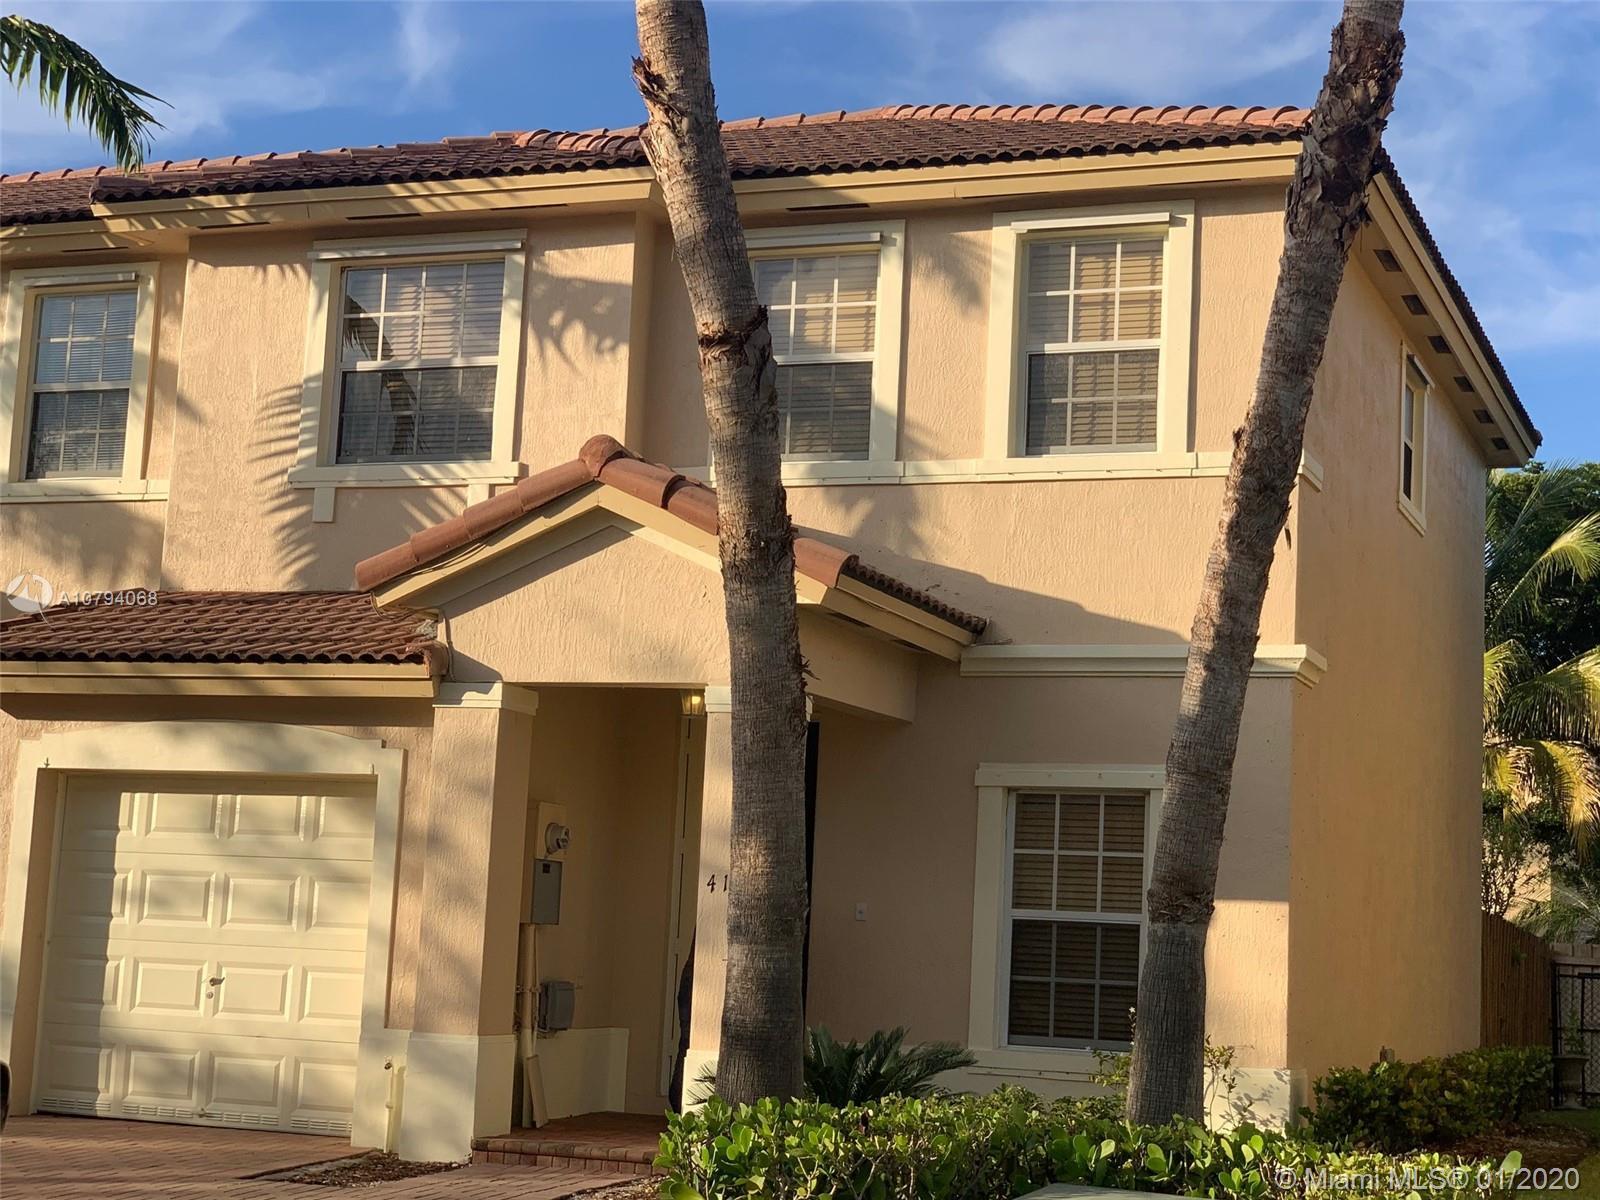 4141 NE 26 St, Homestead, FL 33033 - Homestead, FL real estate listing